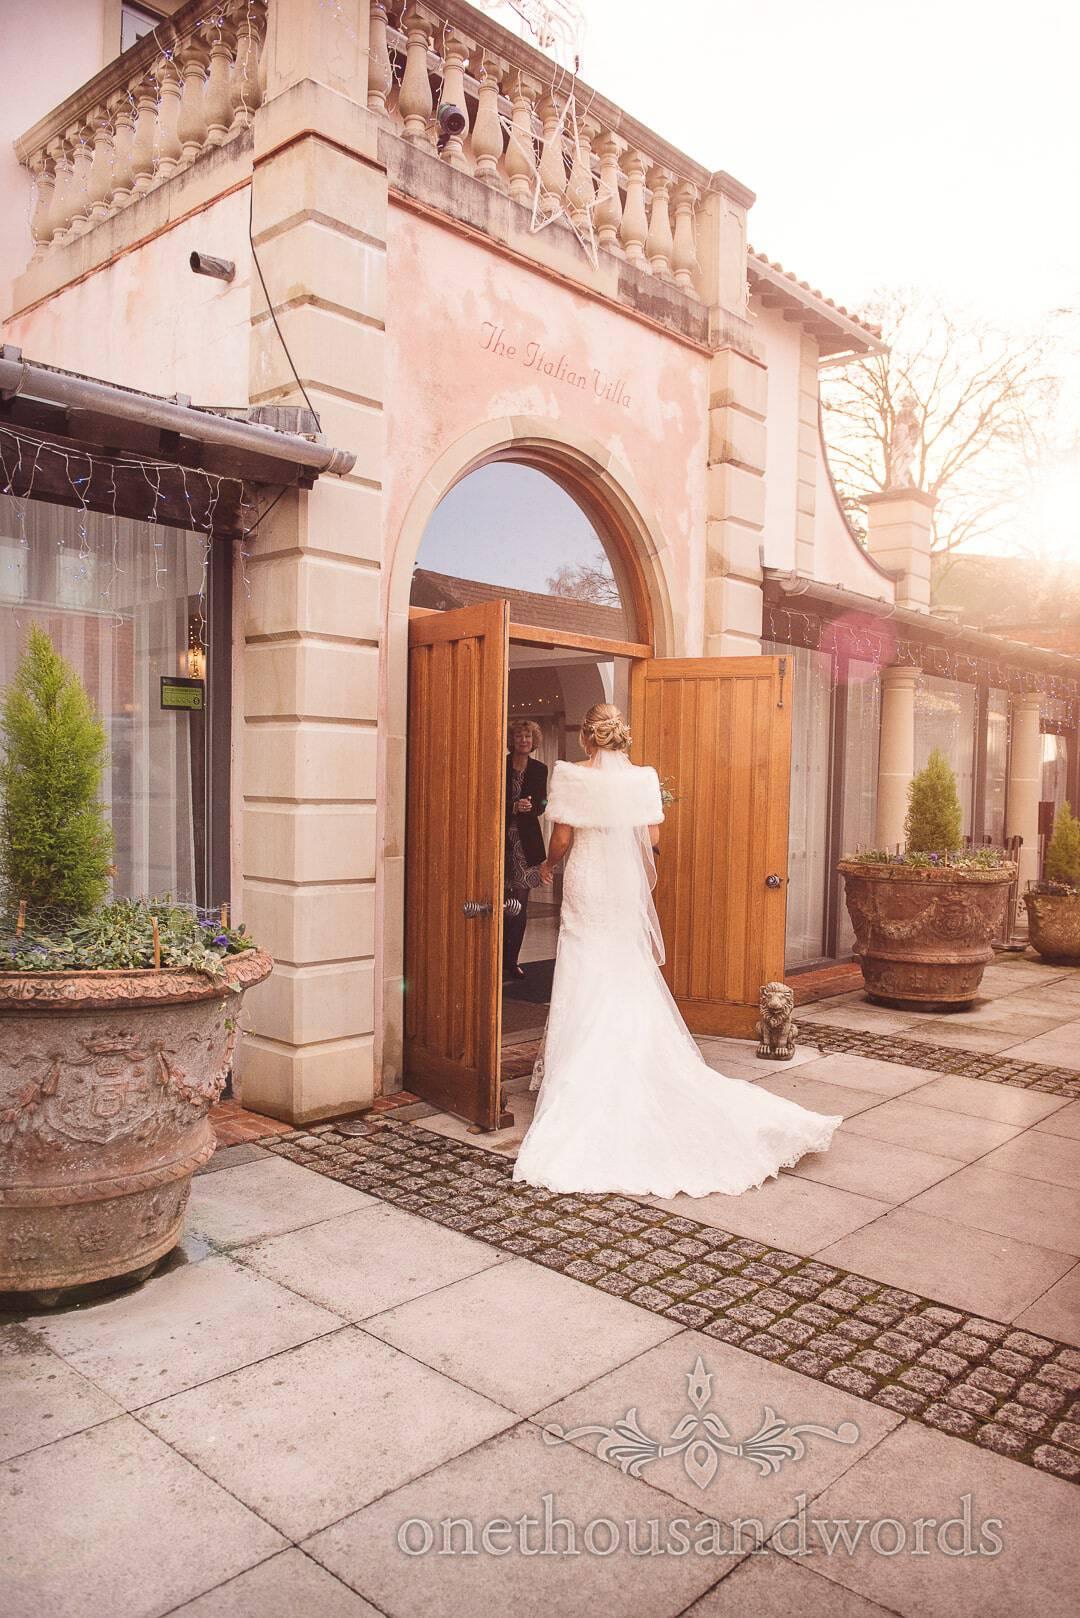 Bride enters Italian Villa Wedding Venue Photographs with Christmas decorations